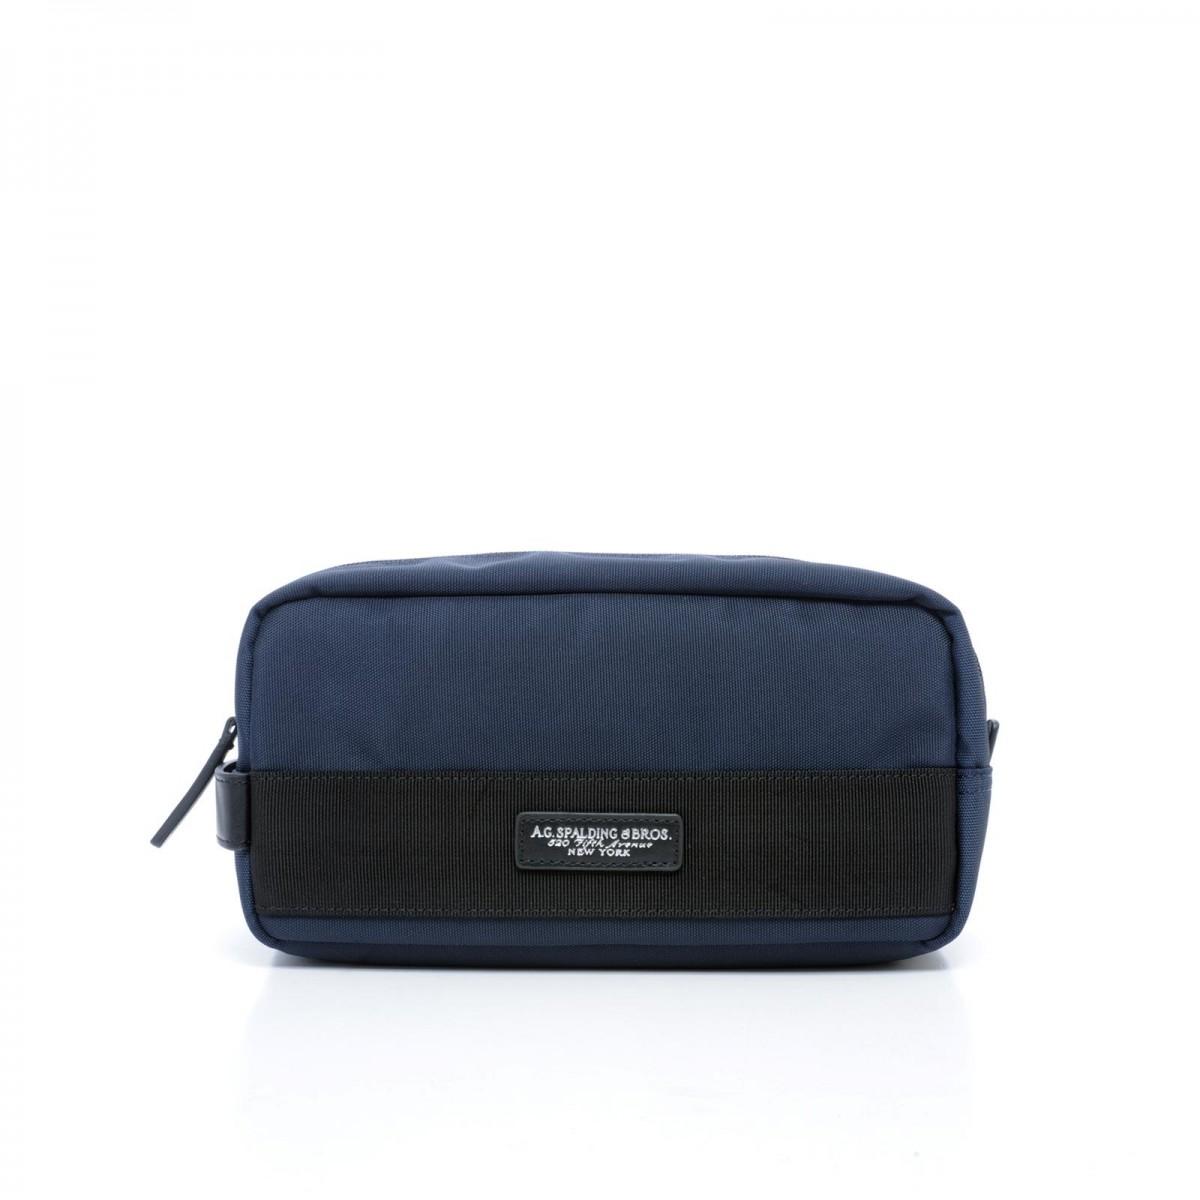 AG SPALDING & BROS New Soft Travel Beauty da viaggio, nylon blu